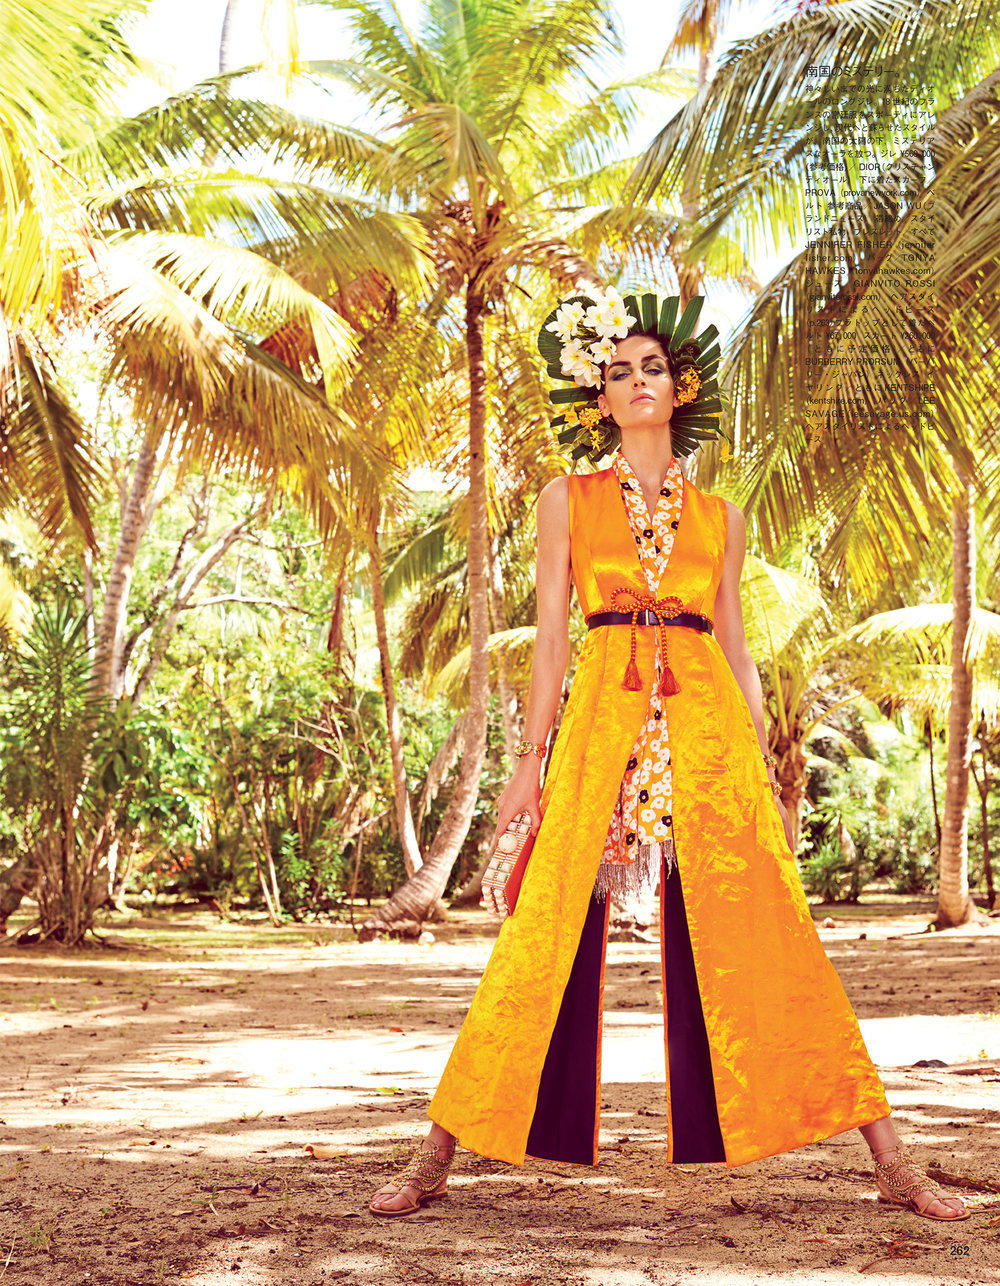 Giovanna-Battaglia-Vogue-Japan-Mariano-Vivanco-Forbidden-Paradise-4.jpg